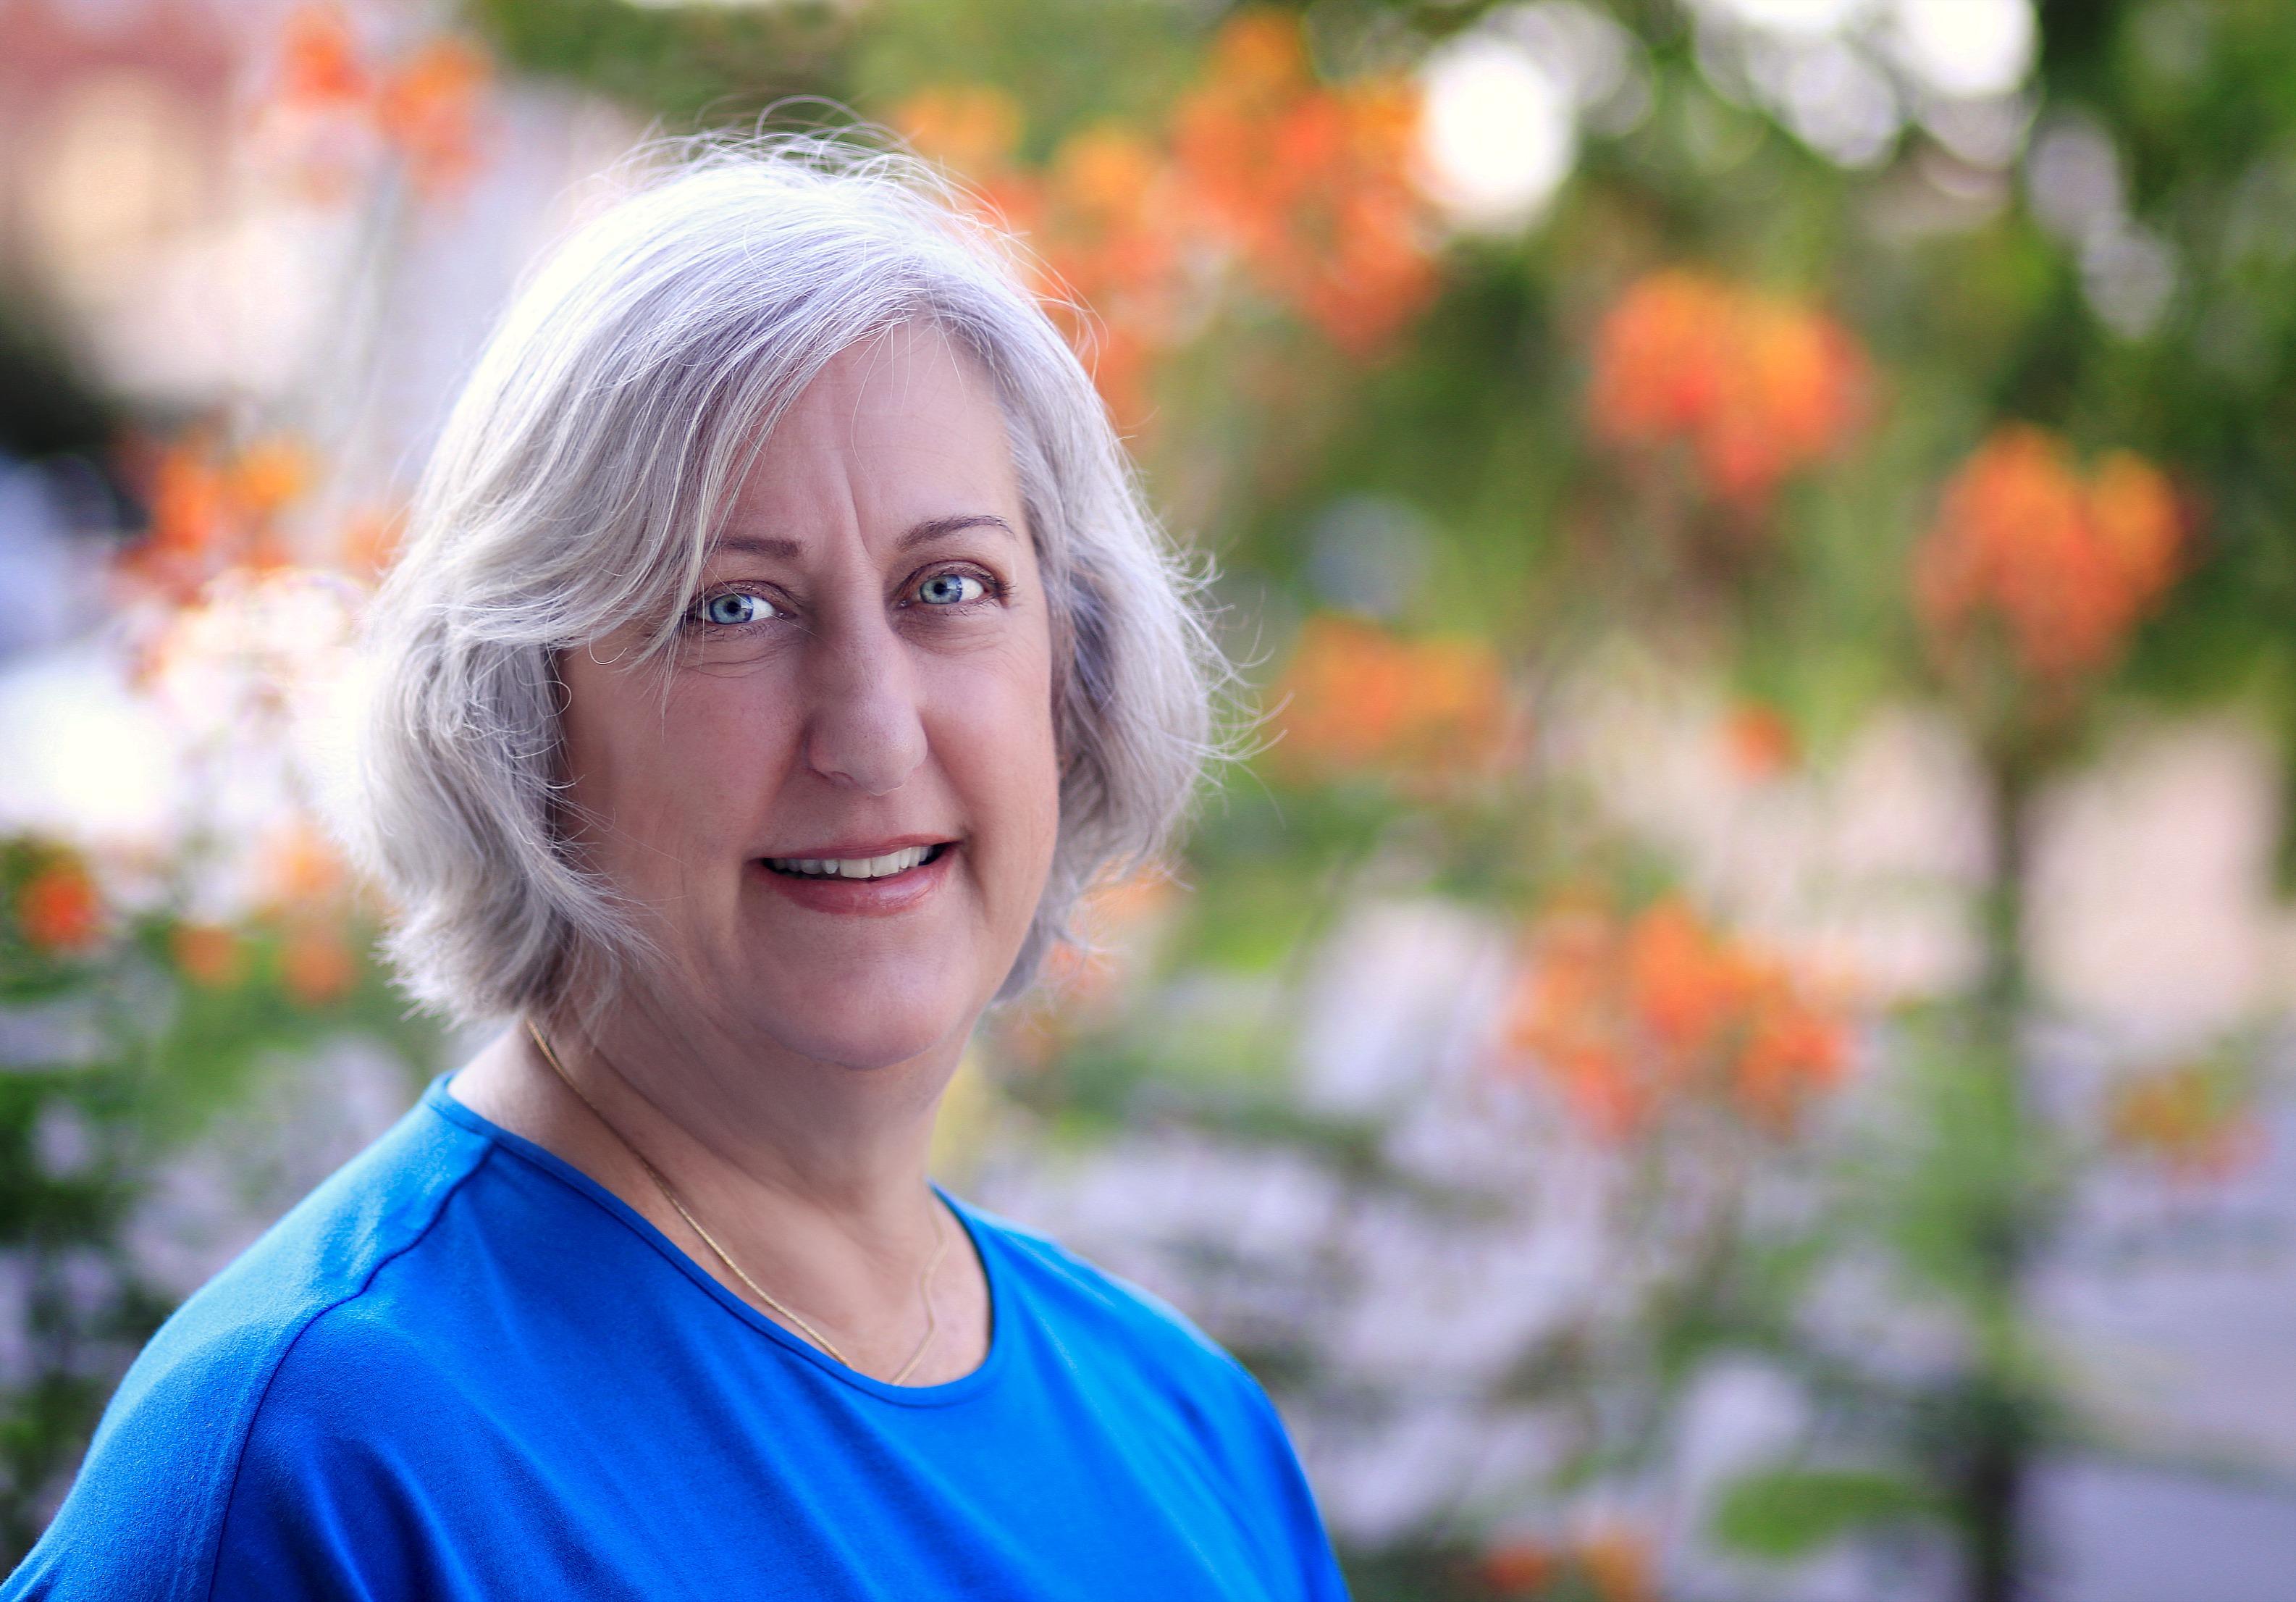 Biography of Carolyn Thompson - Enigmatic Healing